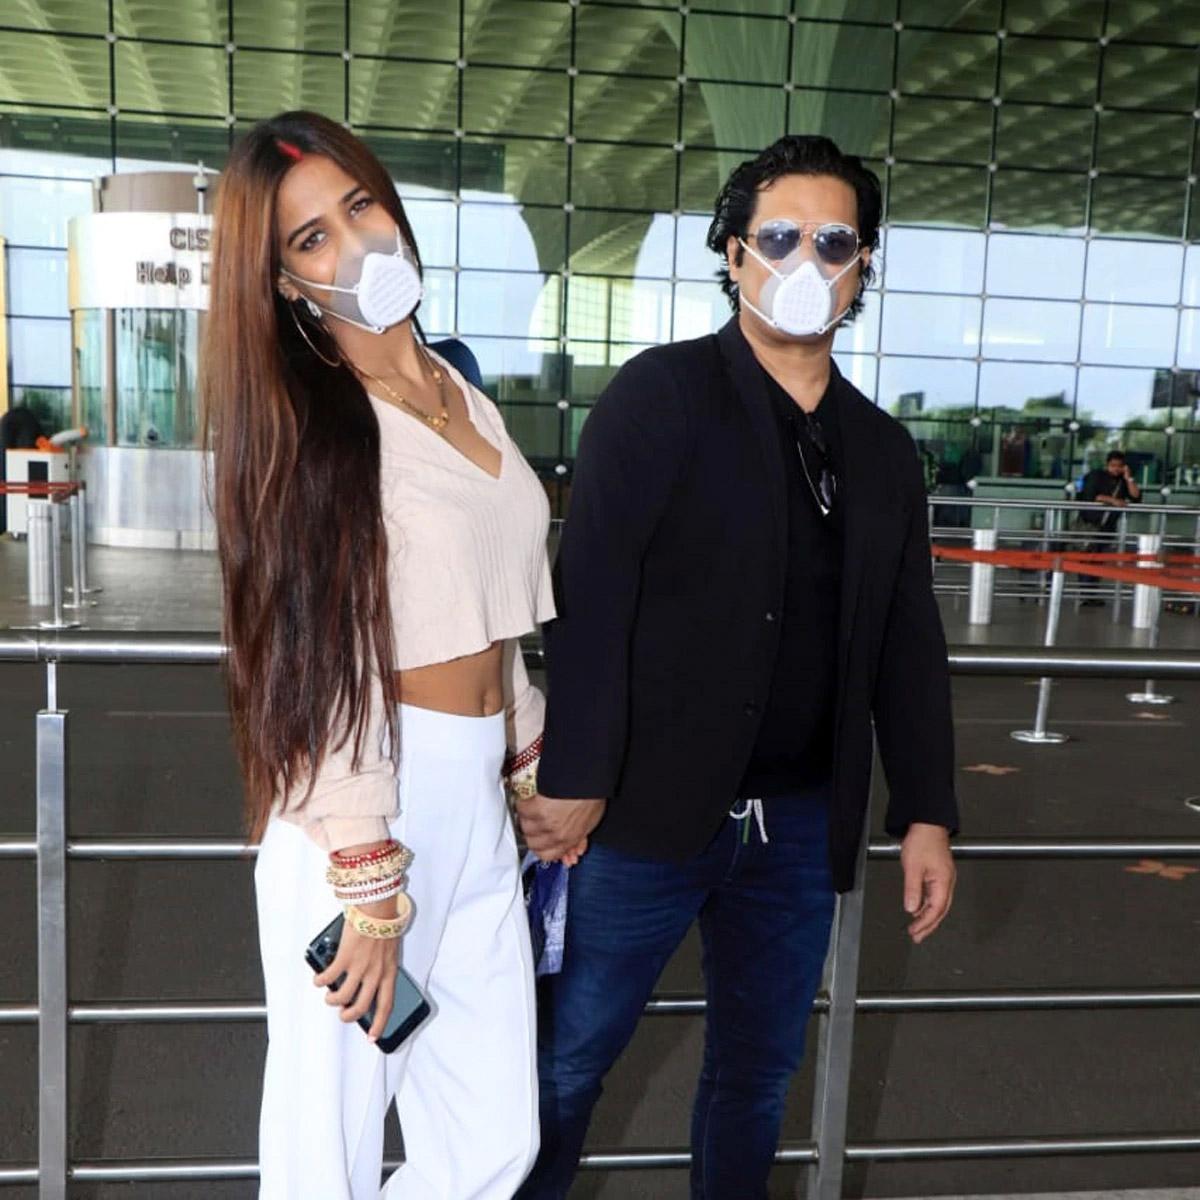 poonam pandey,sindoor,chooda,poonam pandey marriage,husband,airport,entertainment ,पूनम पांडे